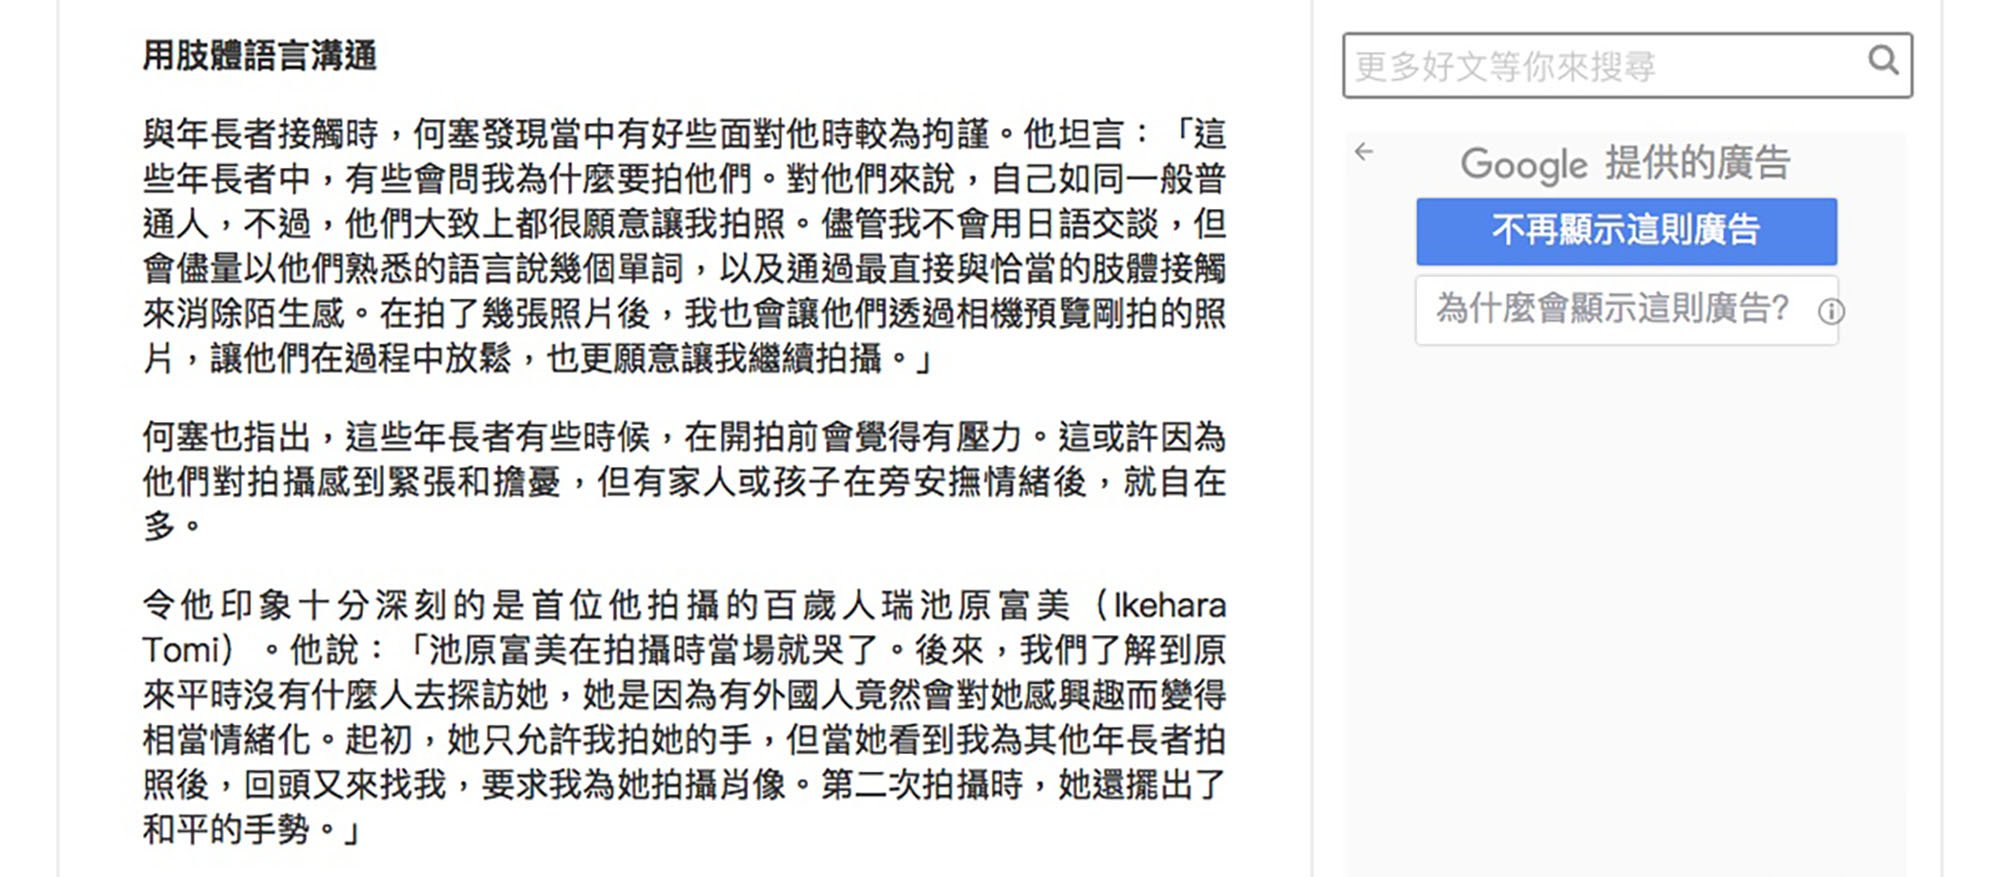 Read Taiwan Longevity Okinawa Jose Jeuland 3